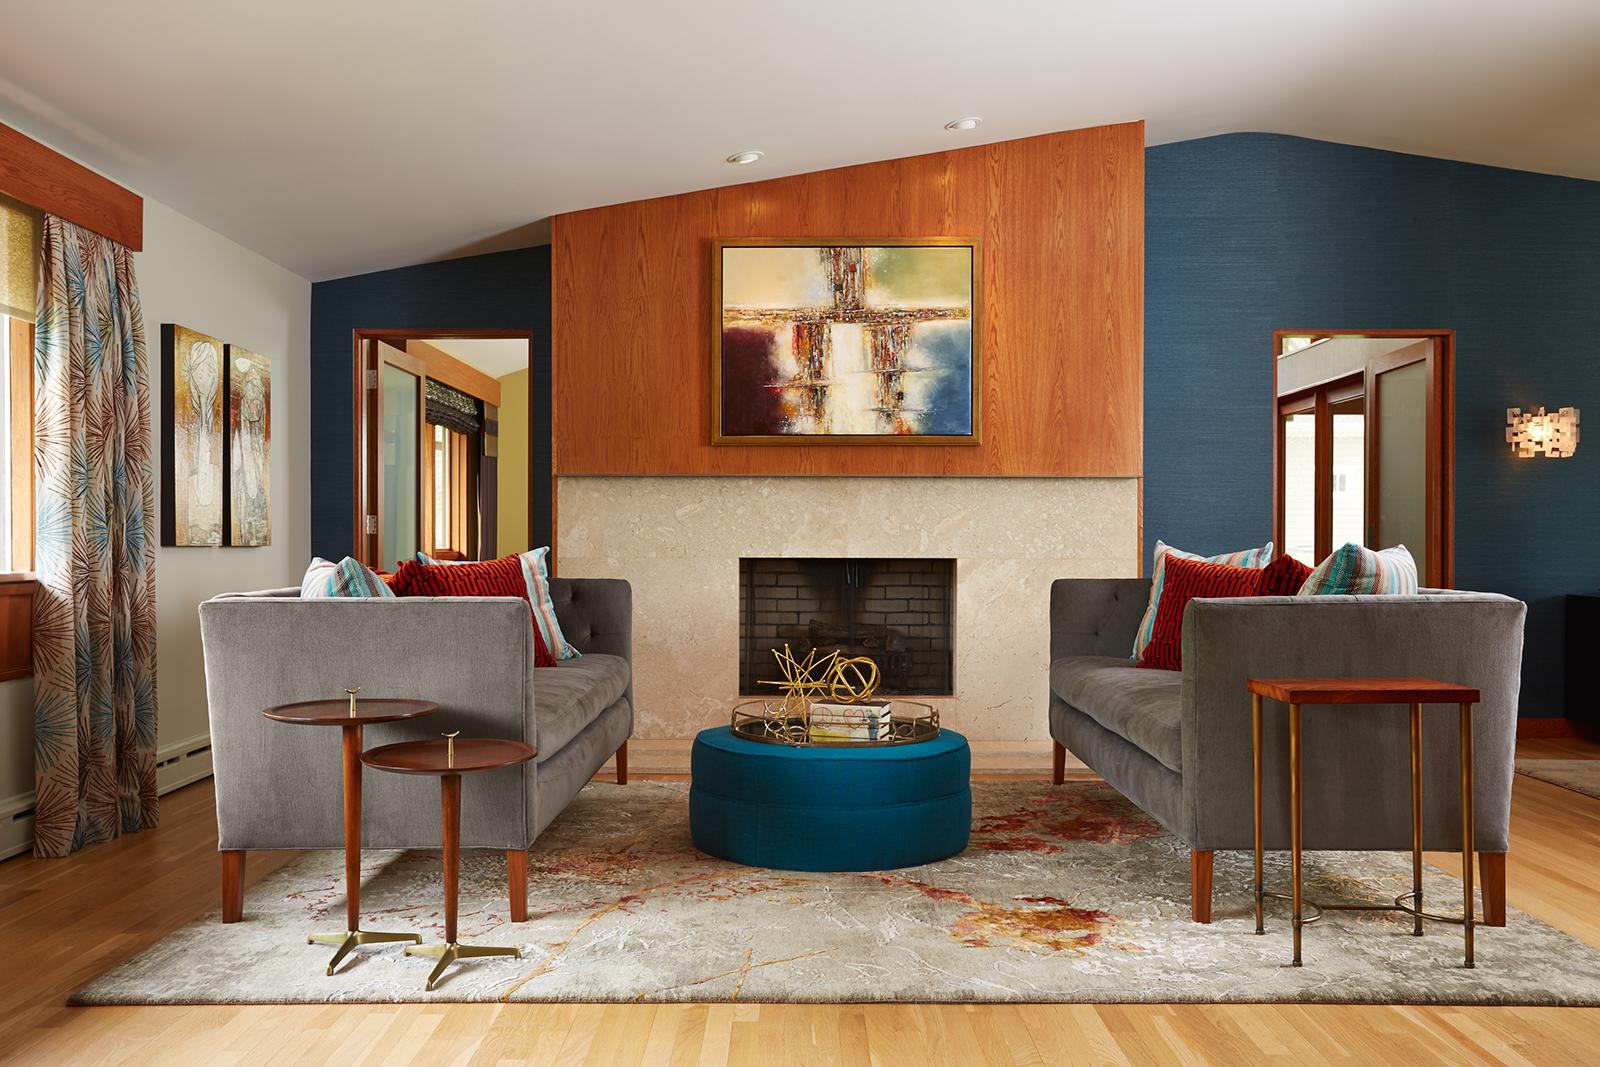 Interior design by Fiddlehead Design Group